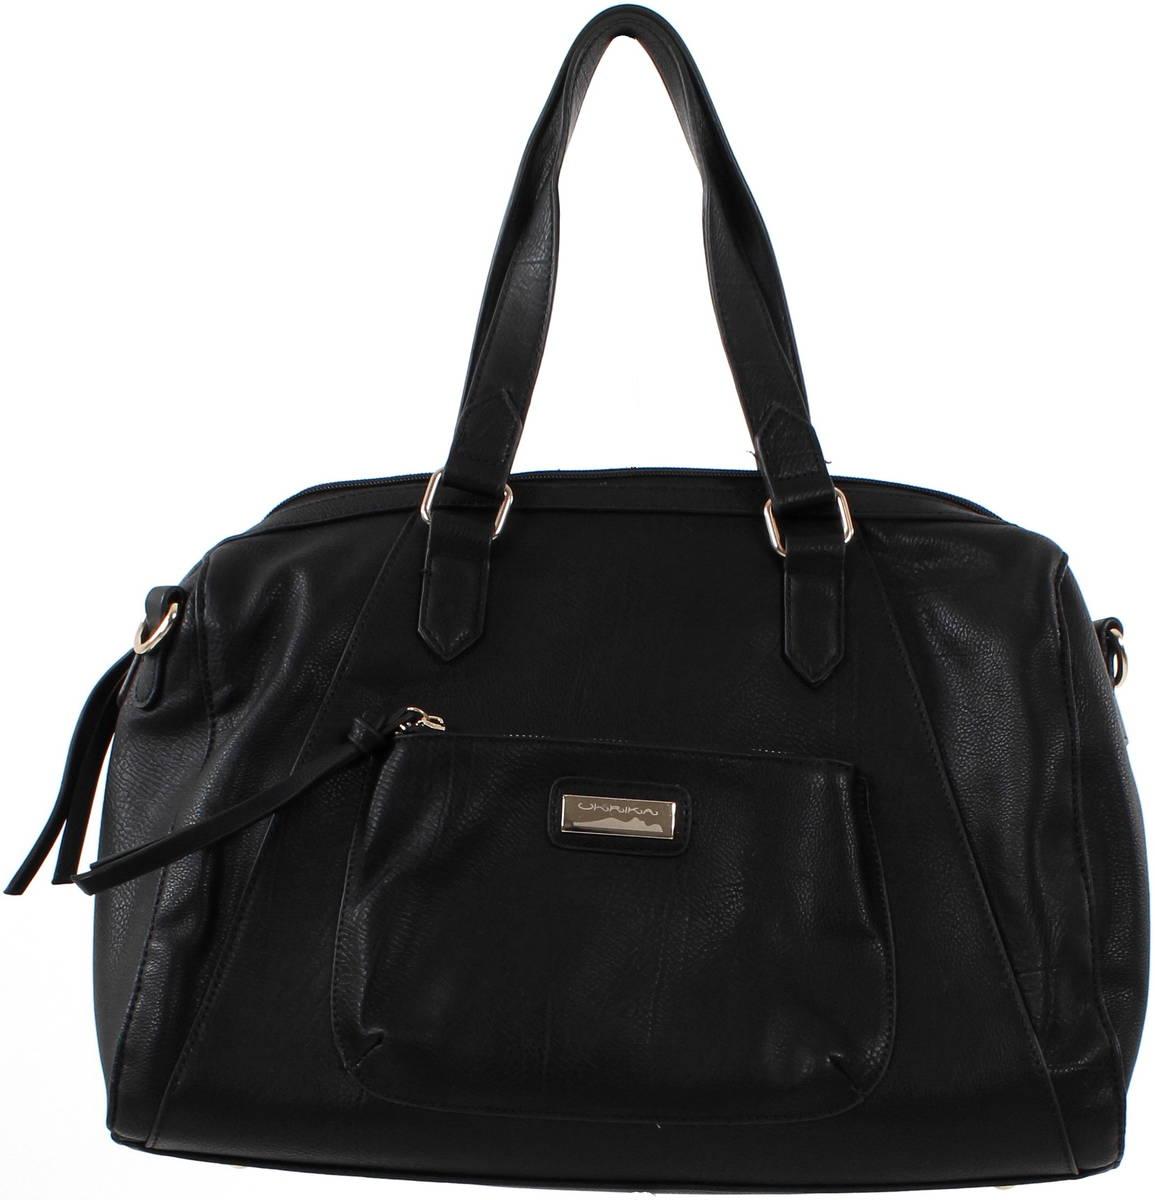 Ysl Musta Laukku : Ulrika handbag  stiletto fi webstore